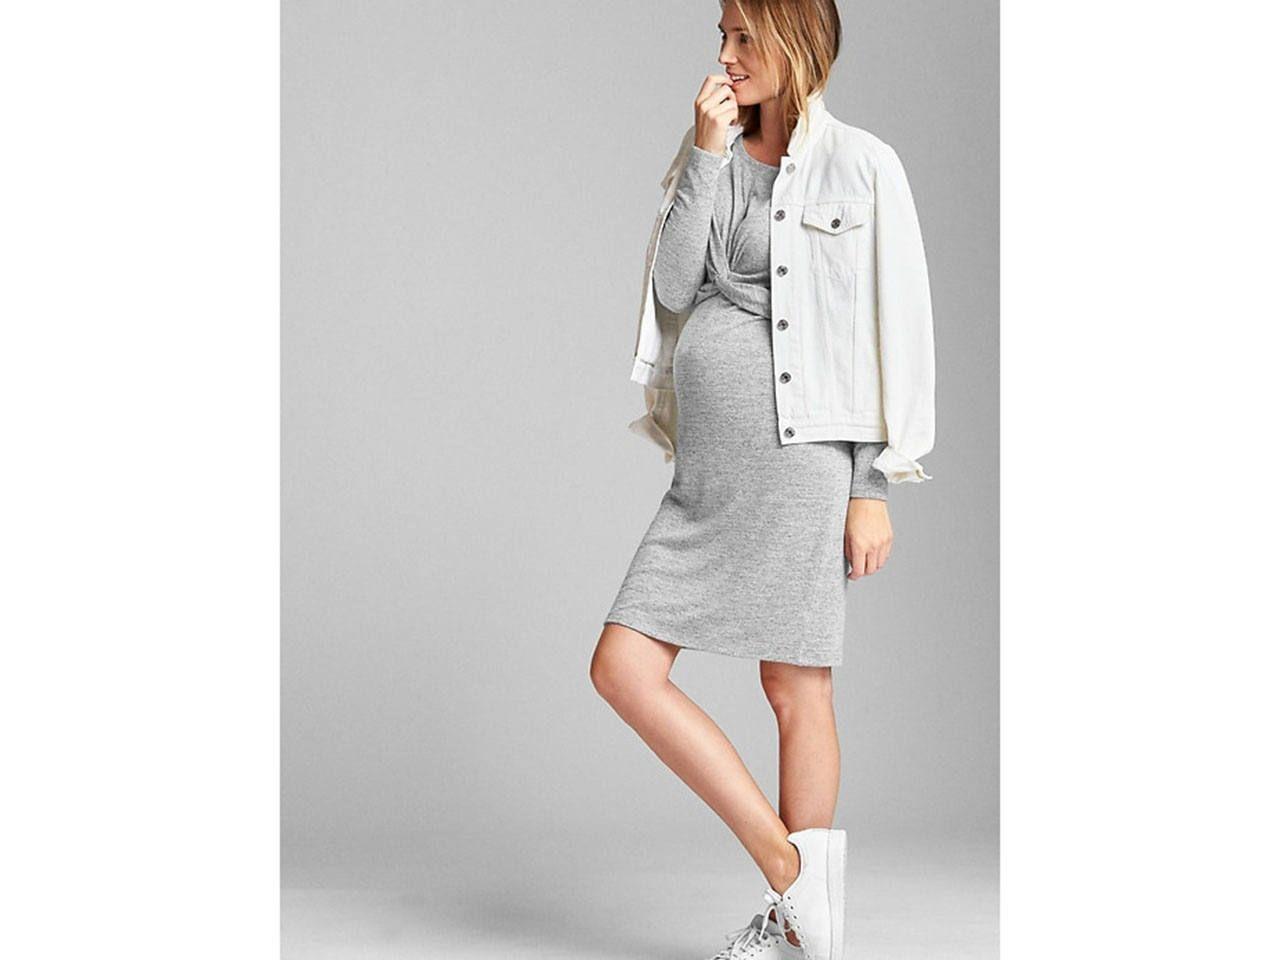 4ba7ab4708d7a A pregnant woman wearing a grey maternity dress and a white denim jacket